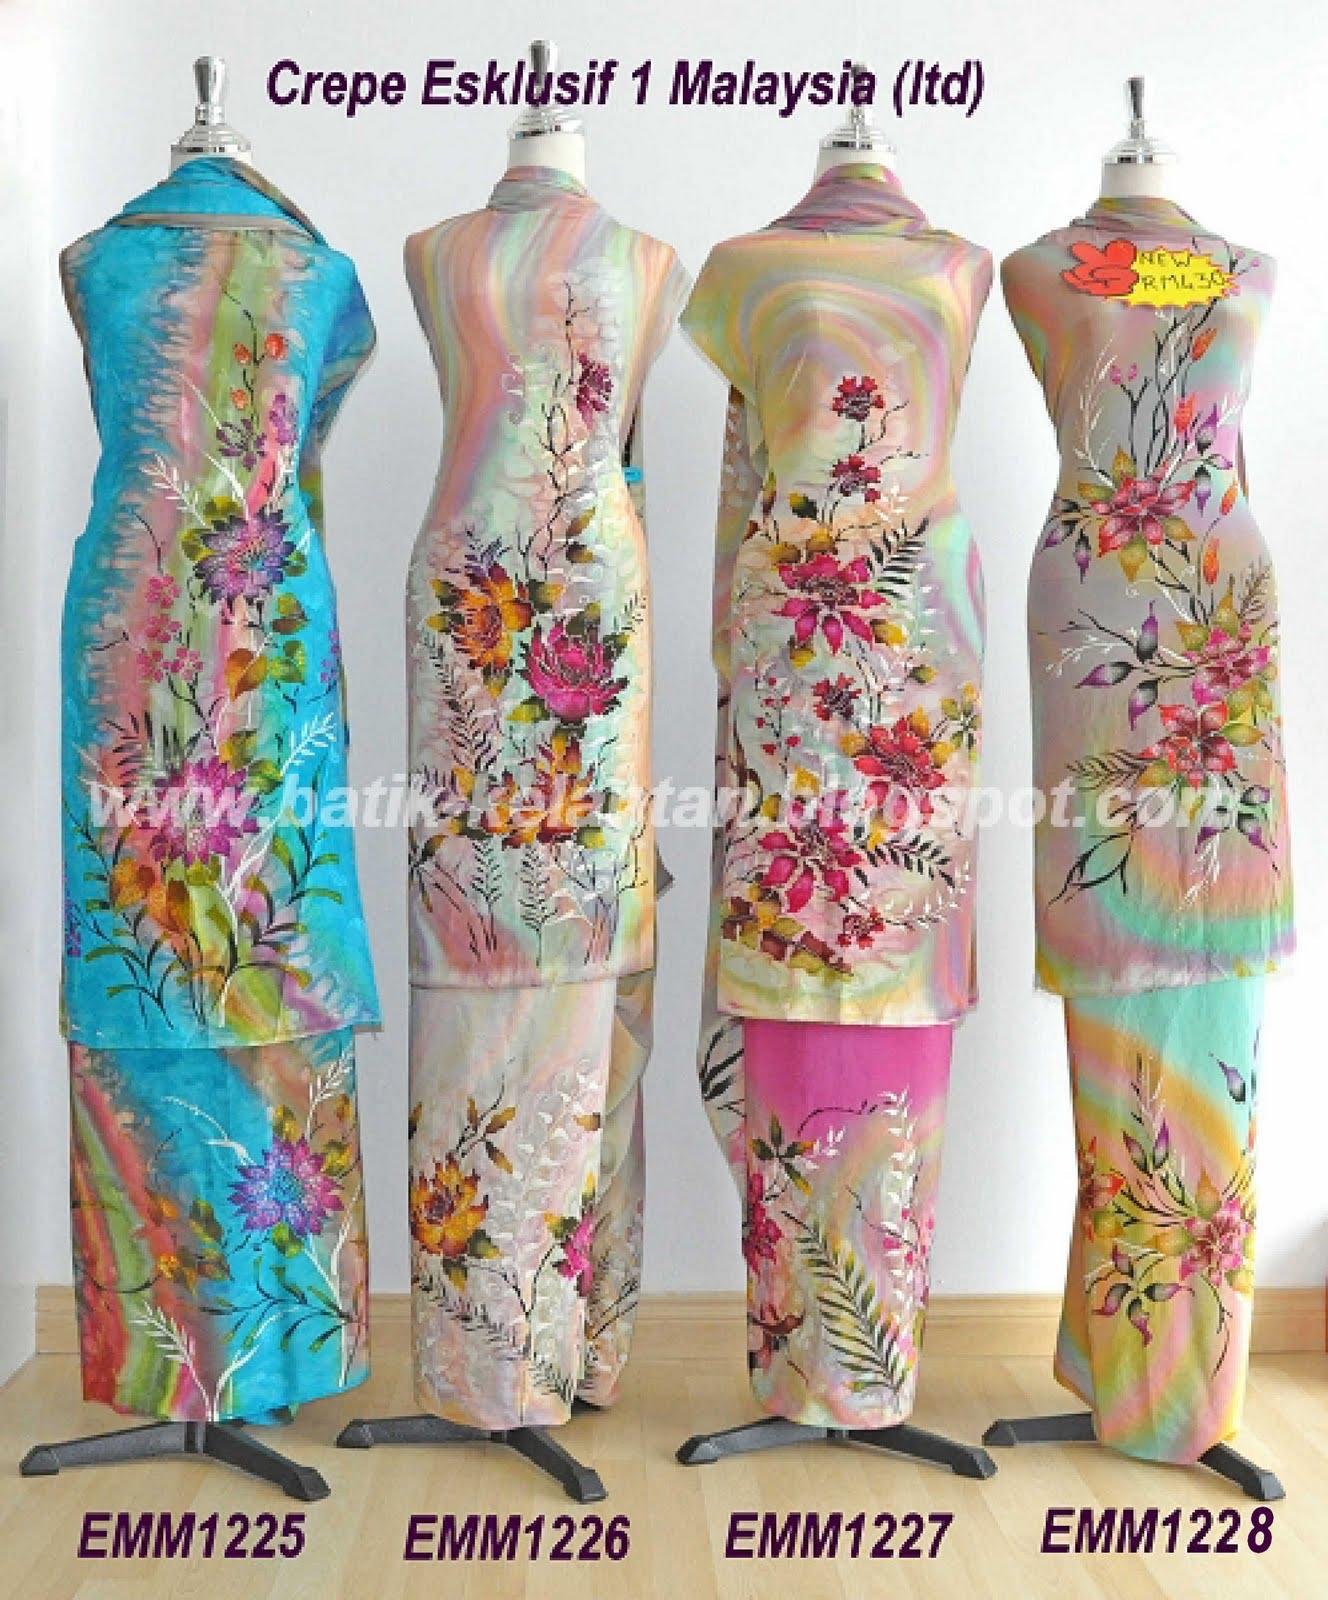 Batik lukis kelantan: Batik Lukis Crepe Esklusif 1 Malaysia (NEW)